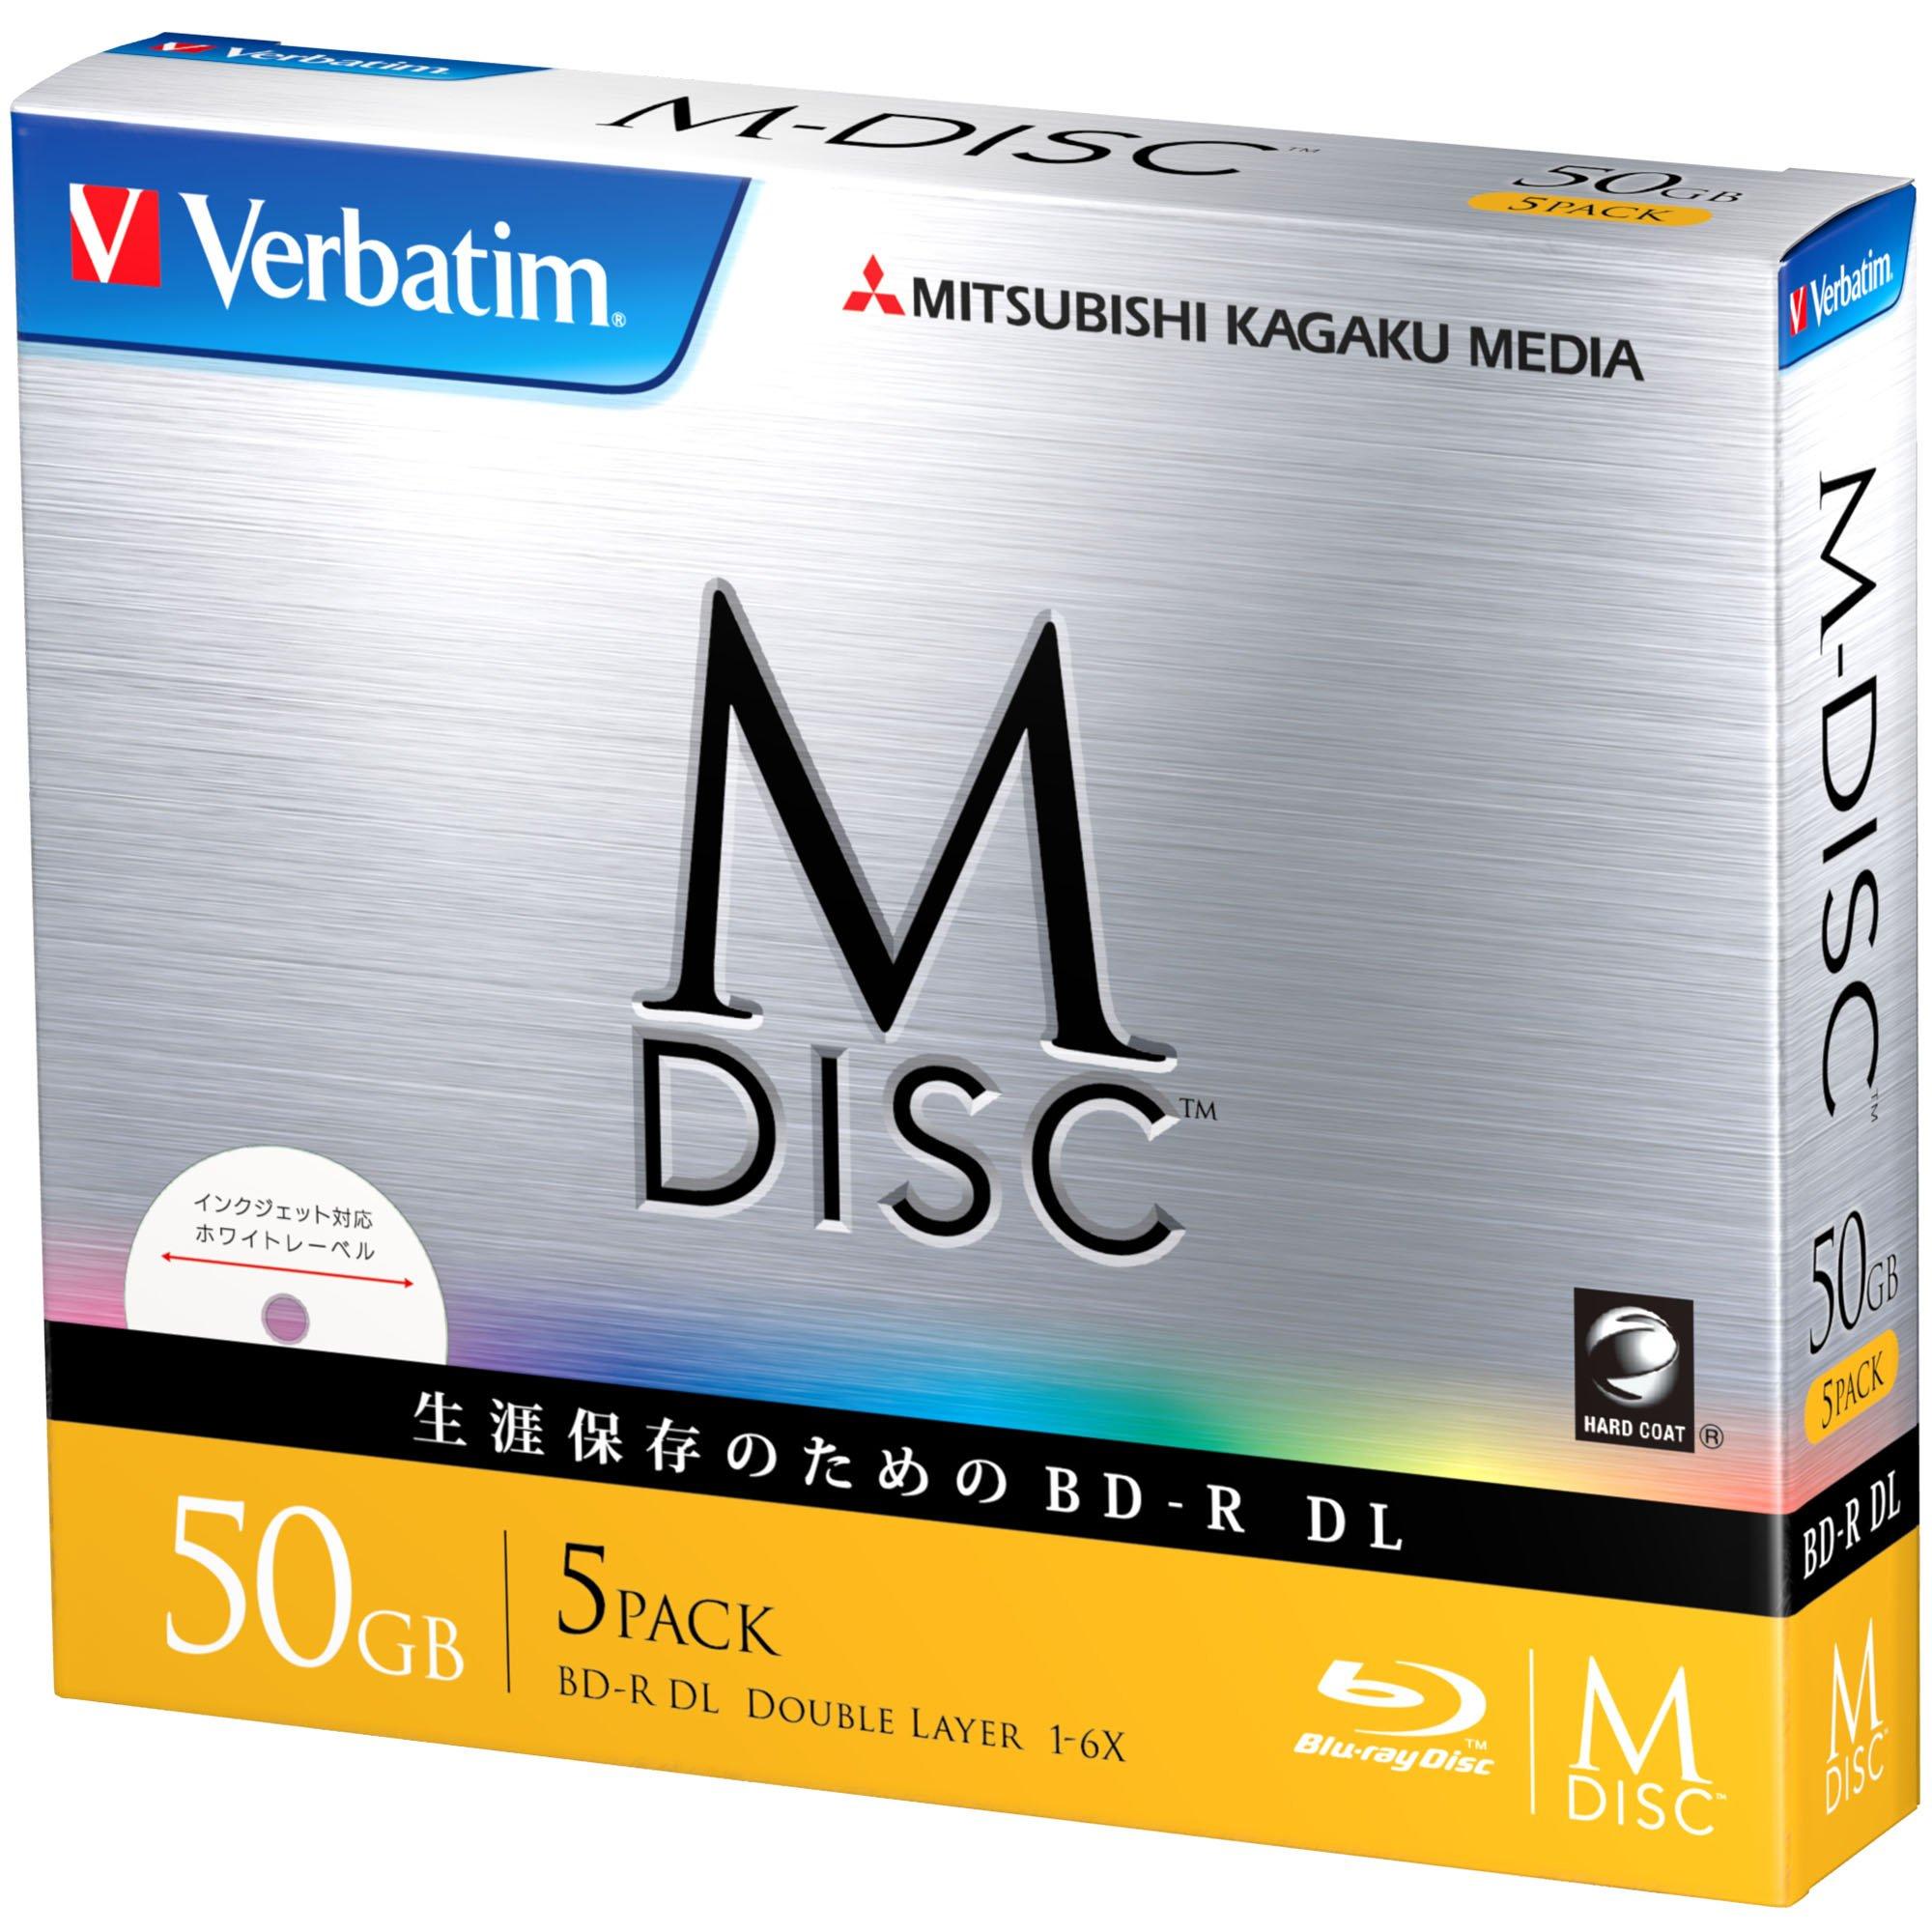 1000 Years Archival Verbatim M-Disc BD-R DL Inkjet Printable | 50GB 6x Speed | 5 Pack Jewel Case